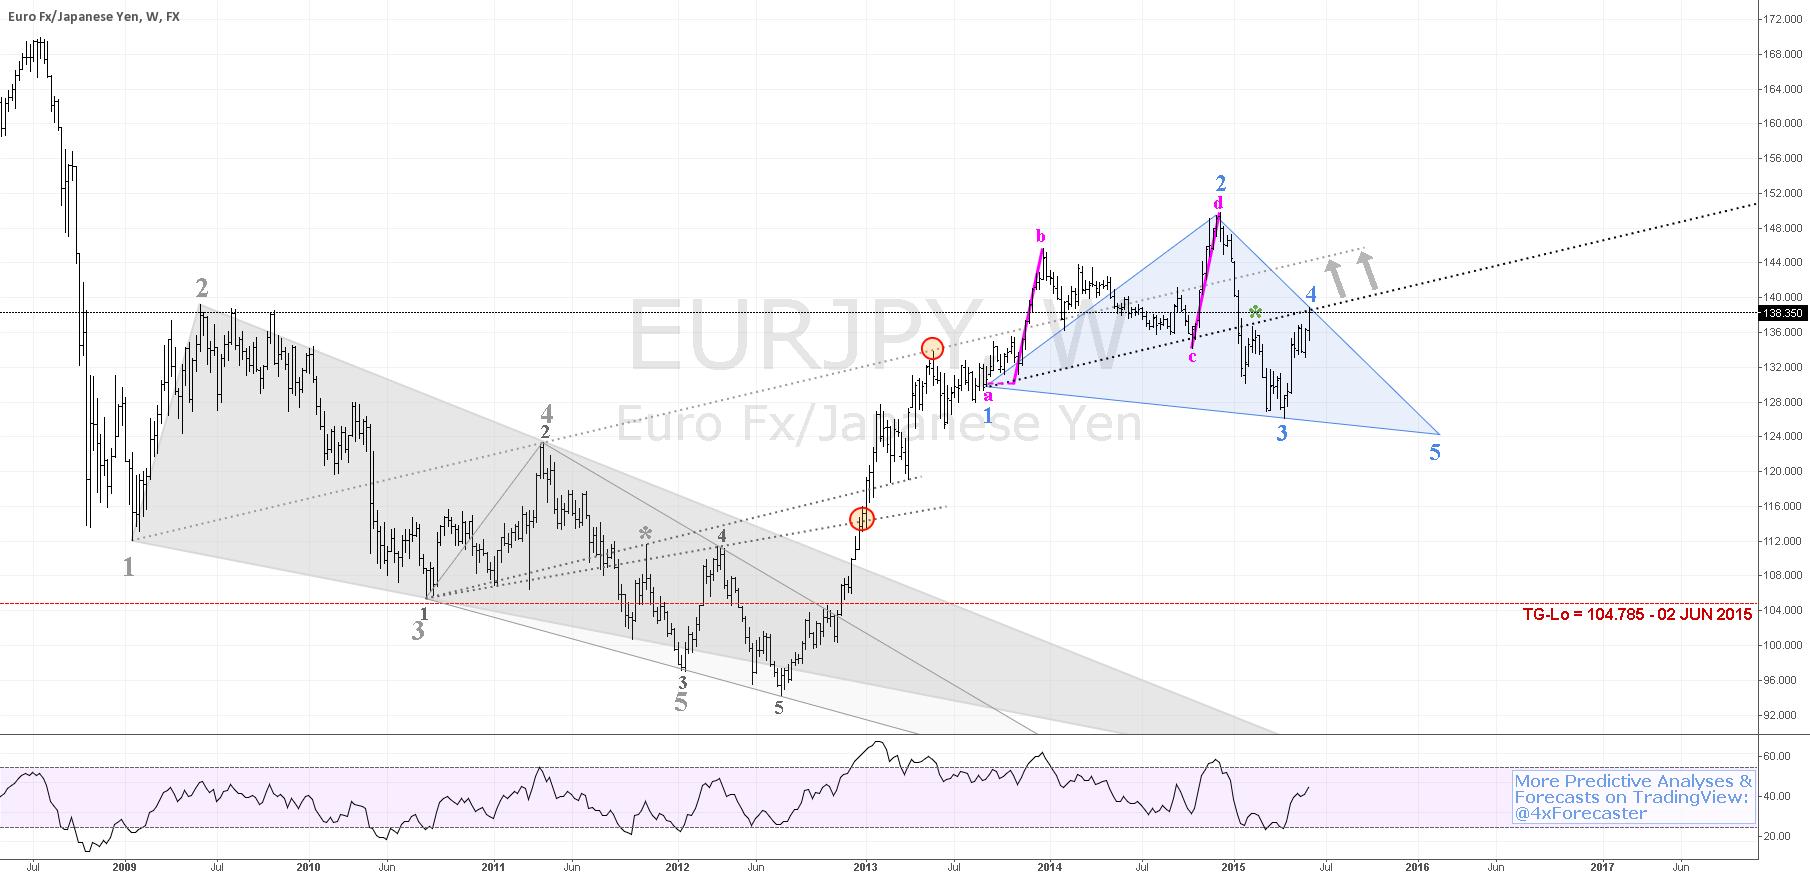 $EUR vs $JPY - Lesson: Occult Geo & Wolfe Wave  #EBC #BOJ #forex